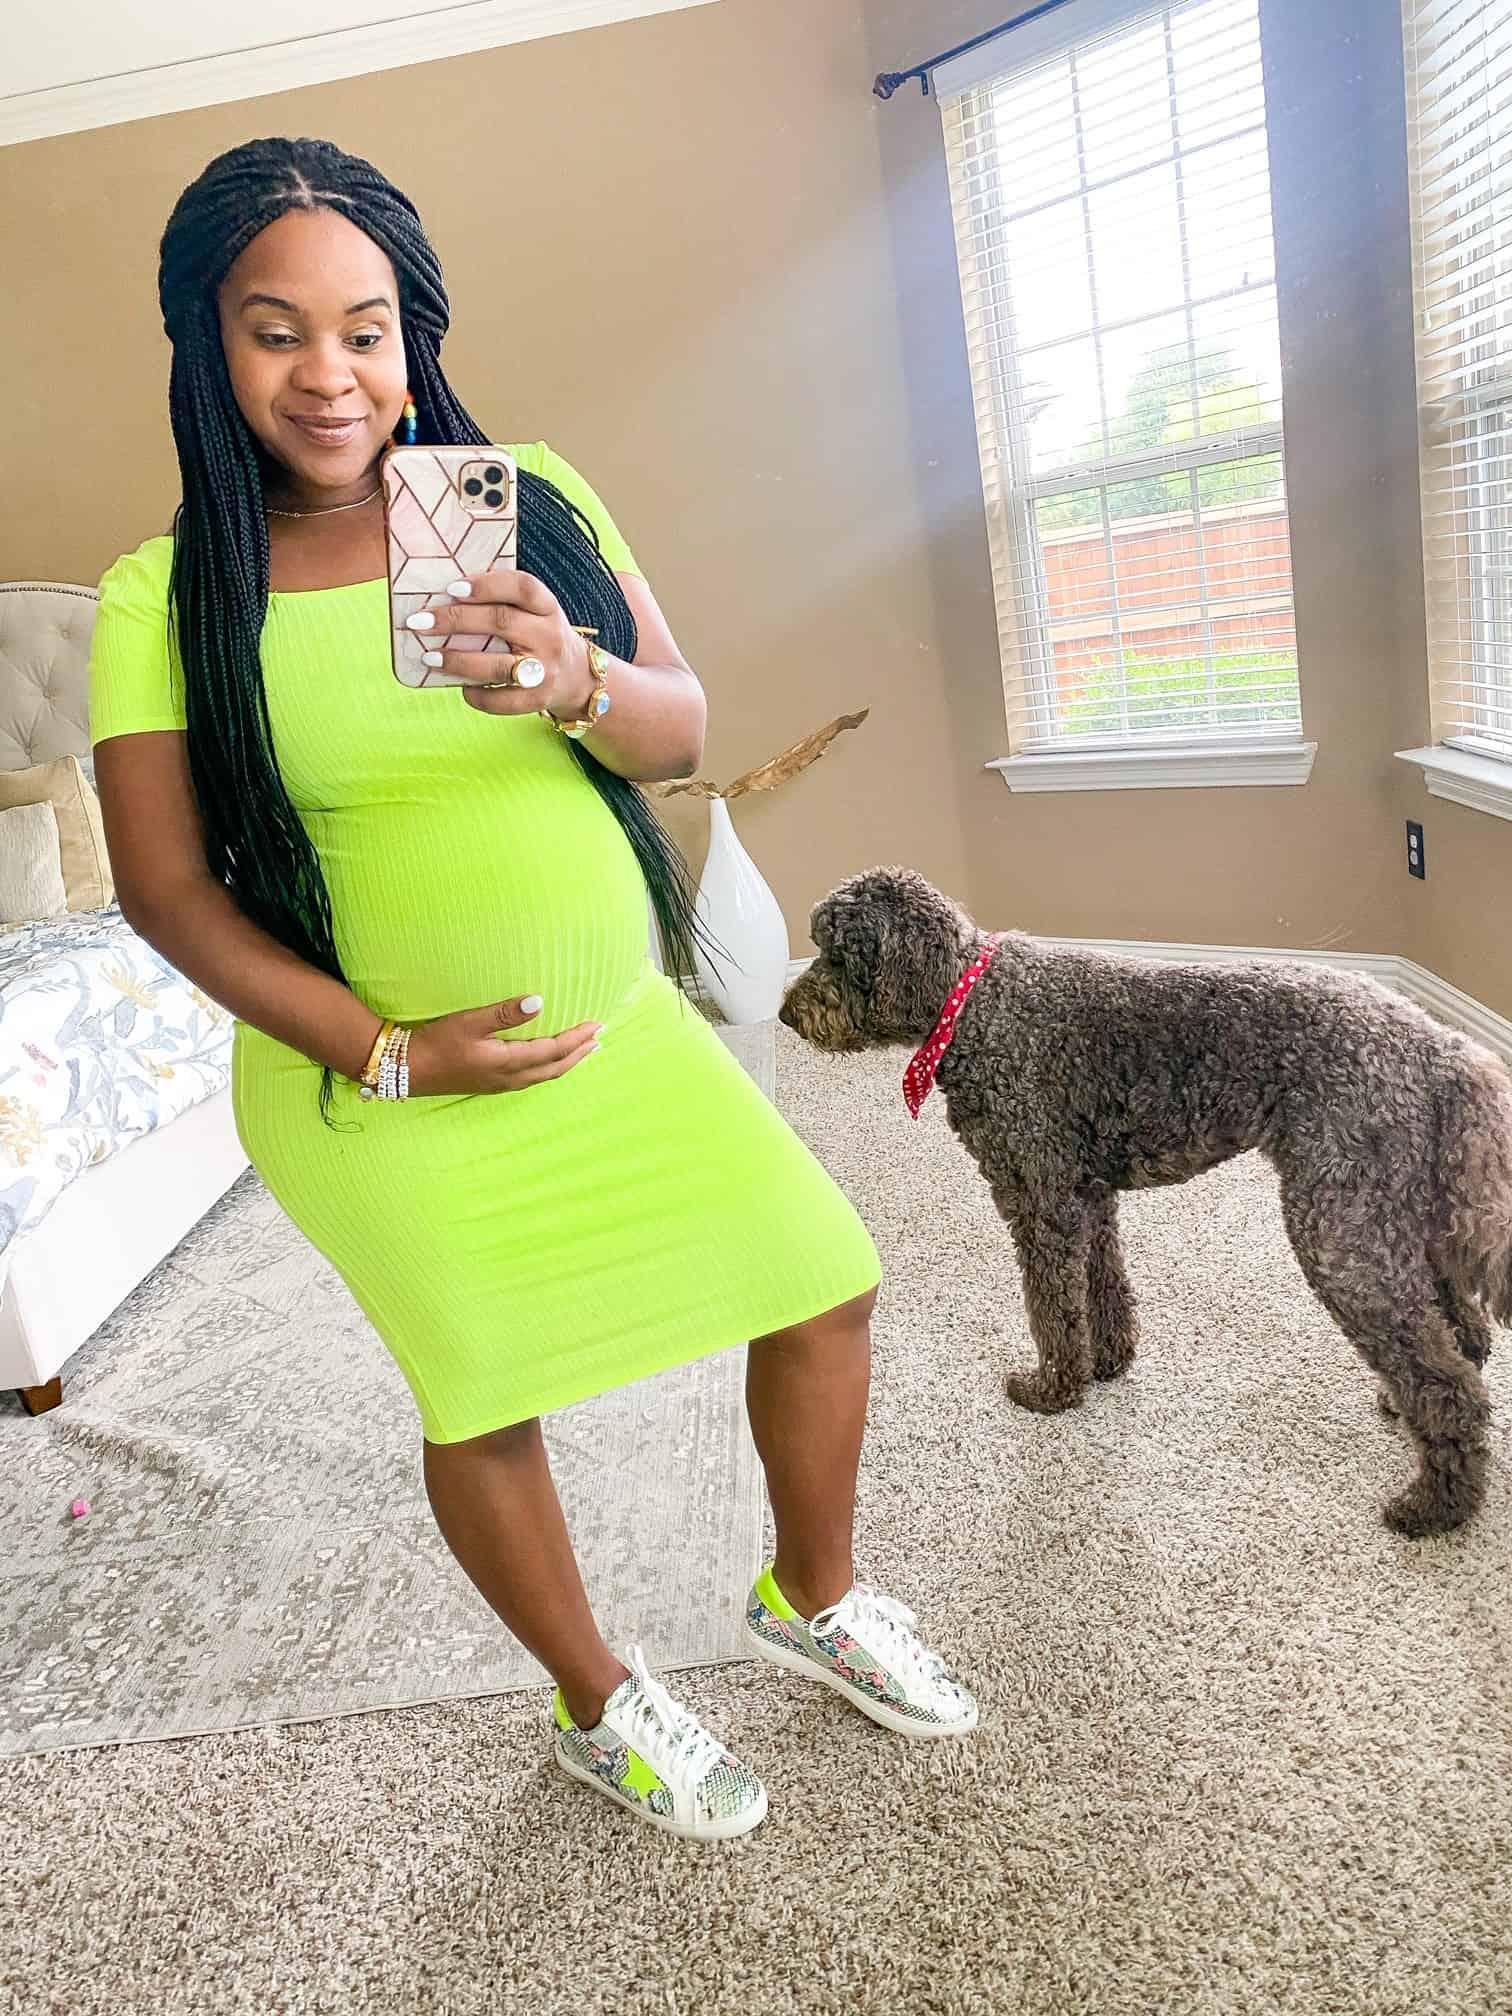 Maternity Dresses by popular Dallas fashion blog, Glamorous Versatility: image of a woman wearing a Pink Blush Waverleigh Neon Lime Short Sleeve Square Neck Midi Maternity Dress.